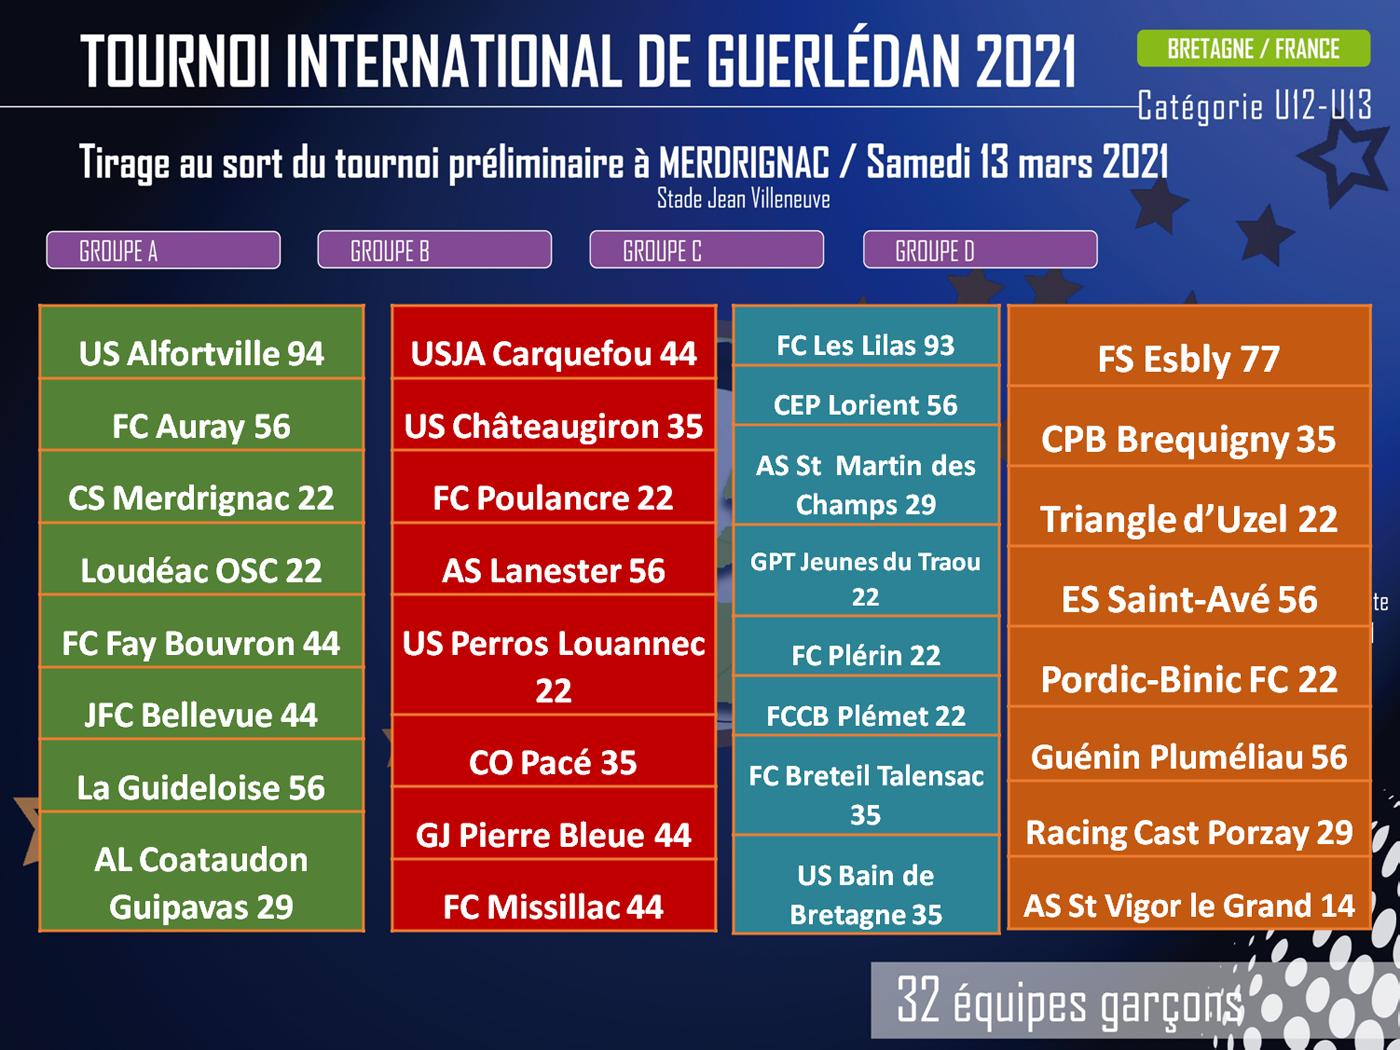 Tirage Merdrignac 2021